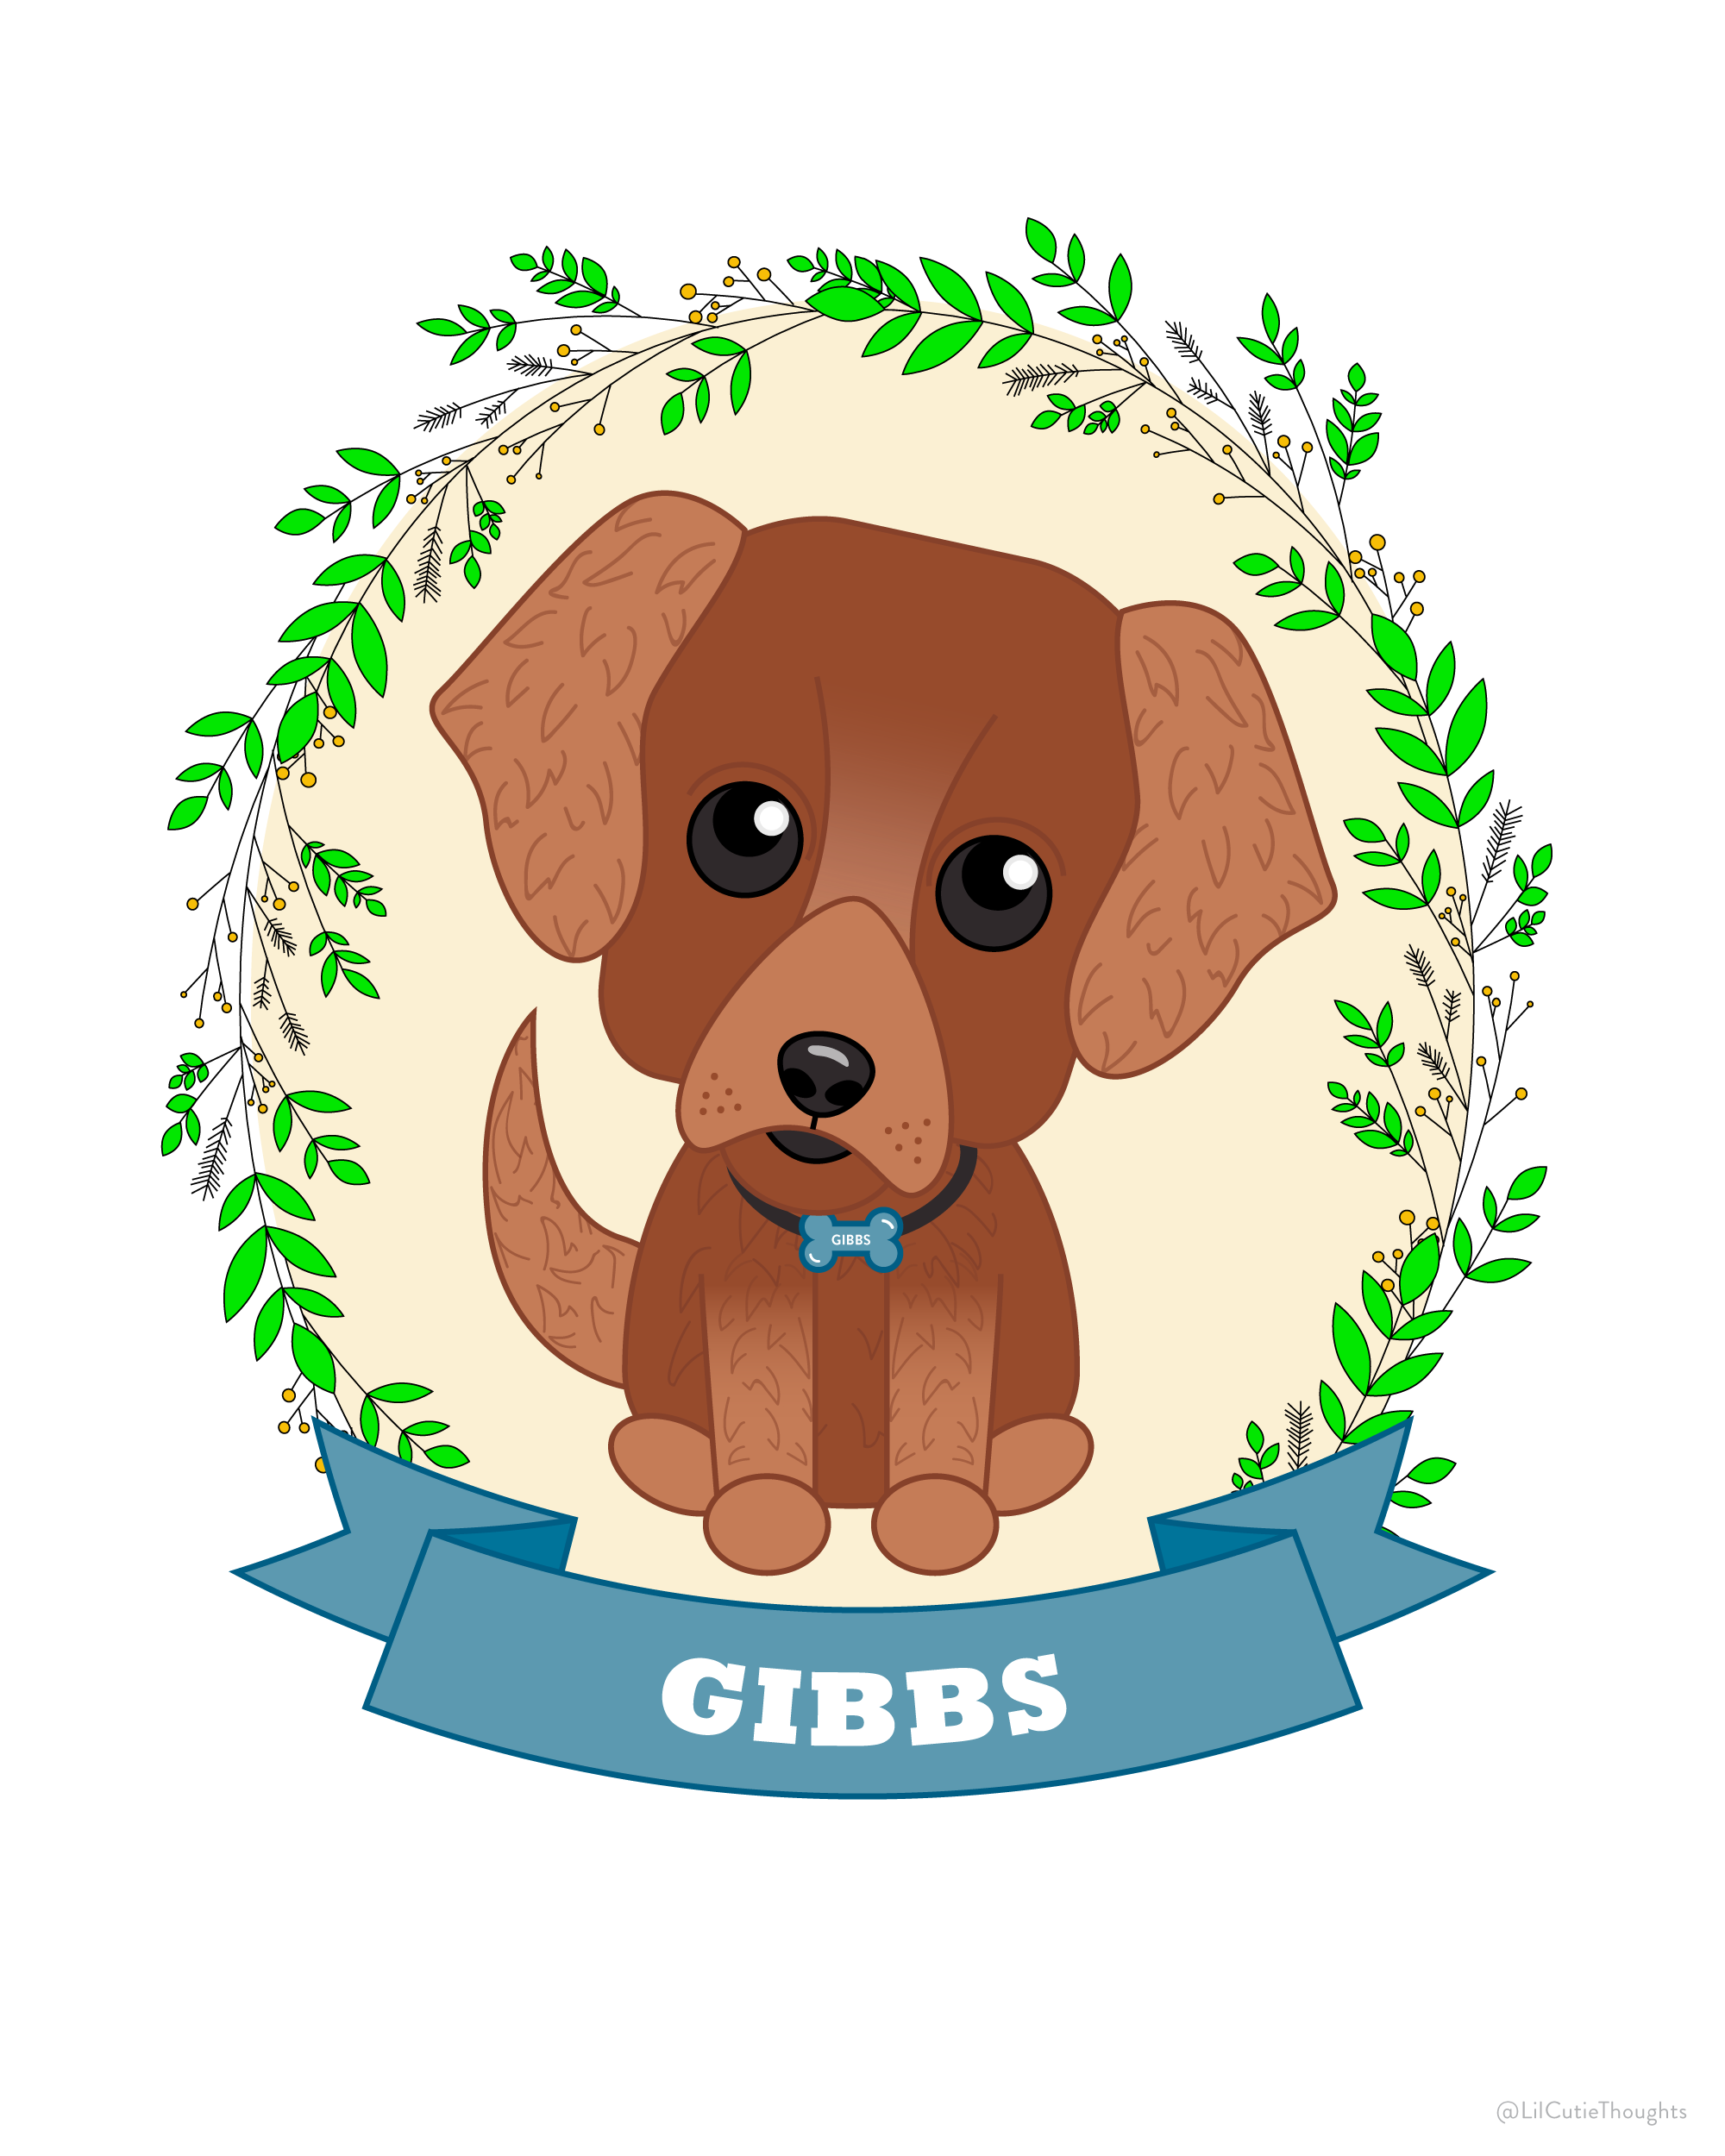 lct_gibbs.png